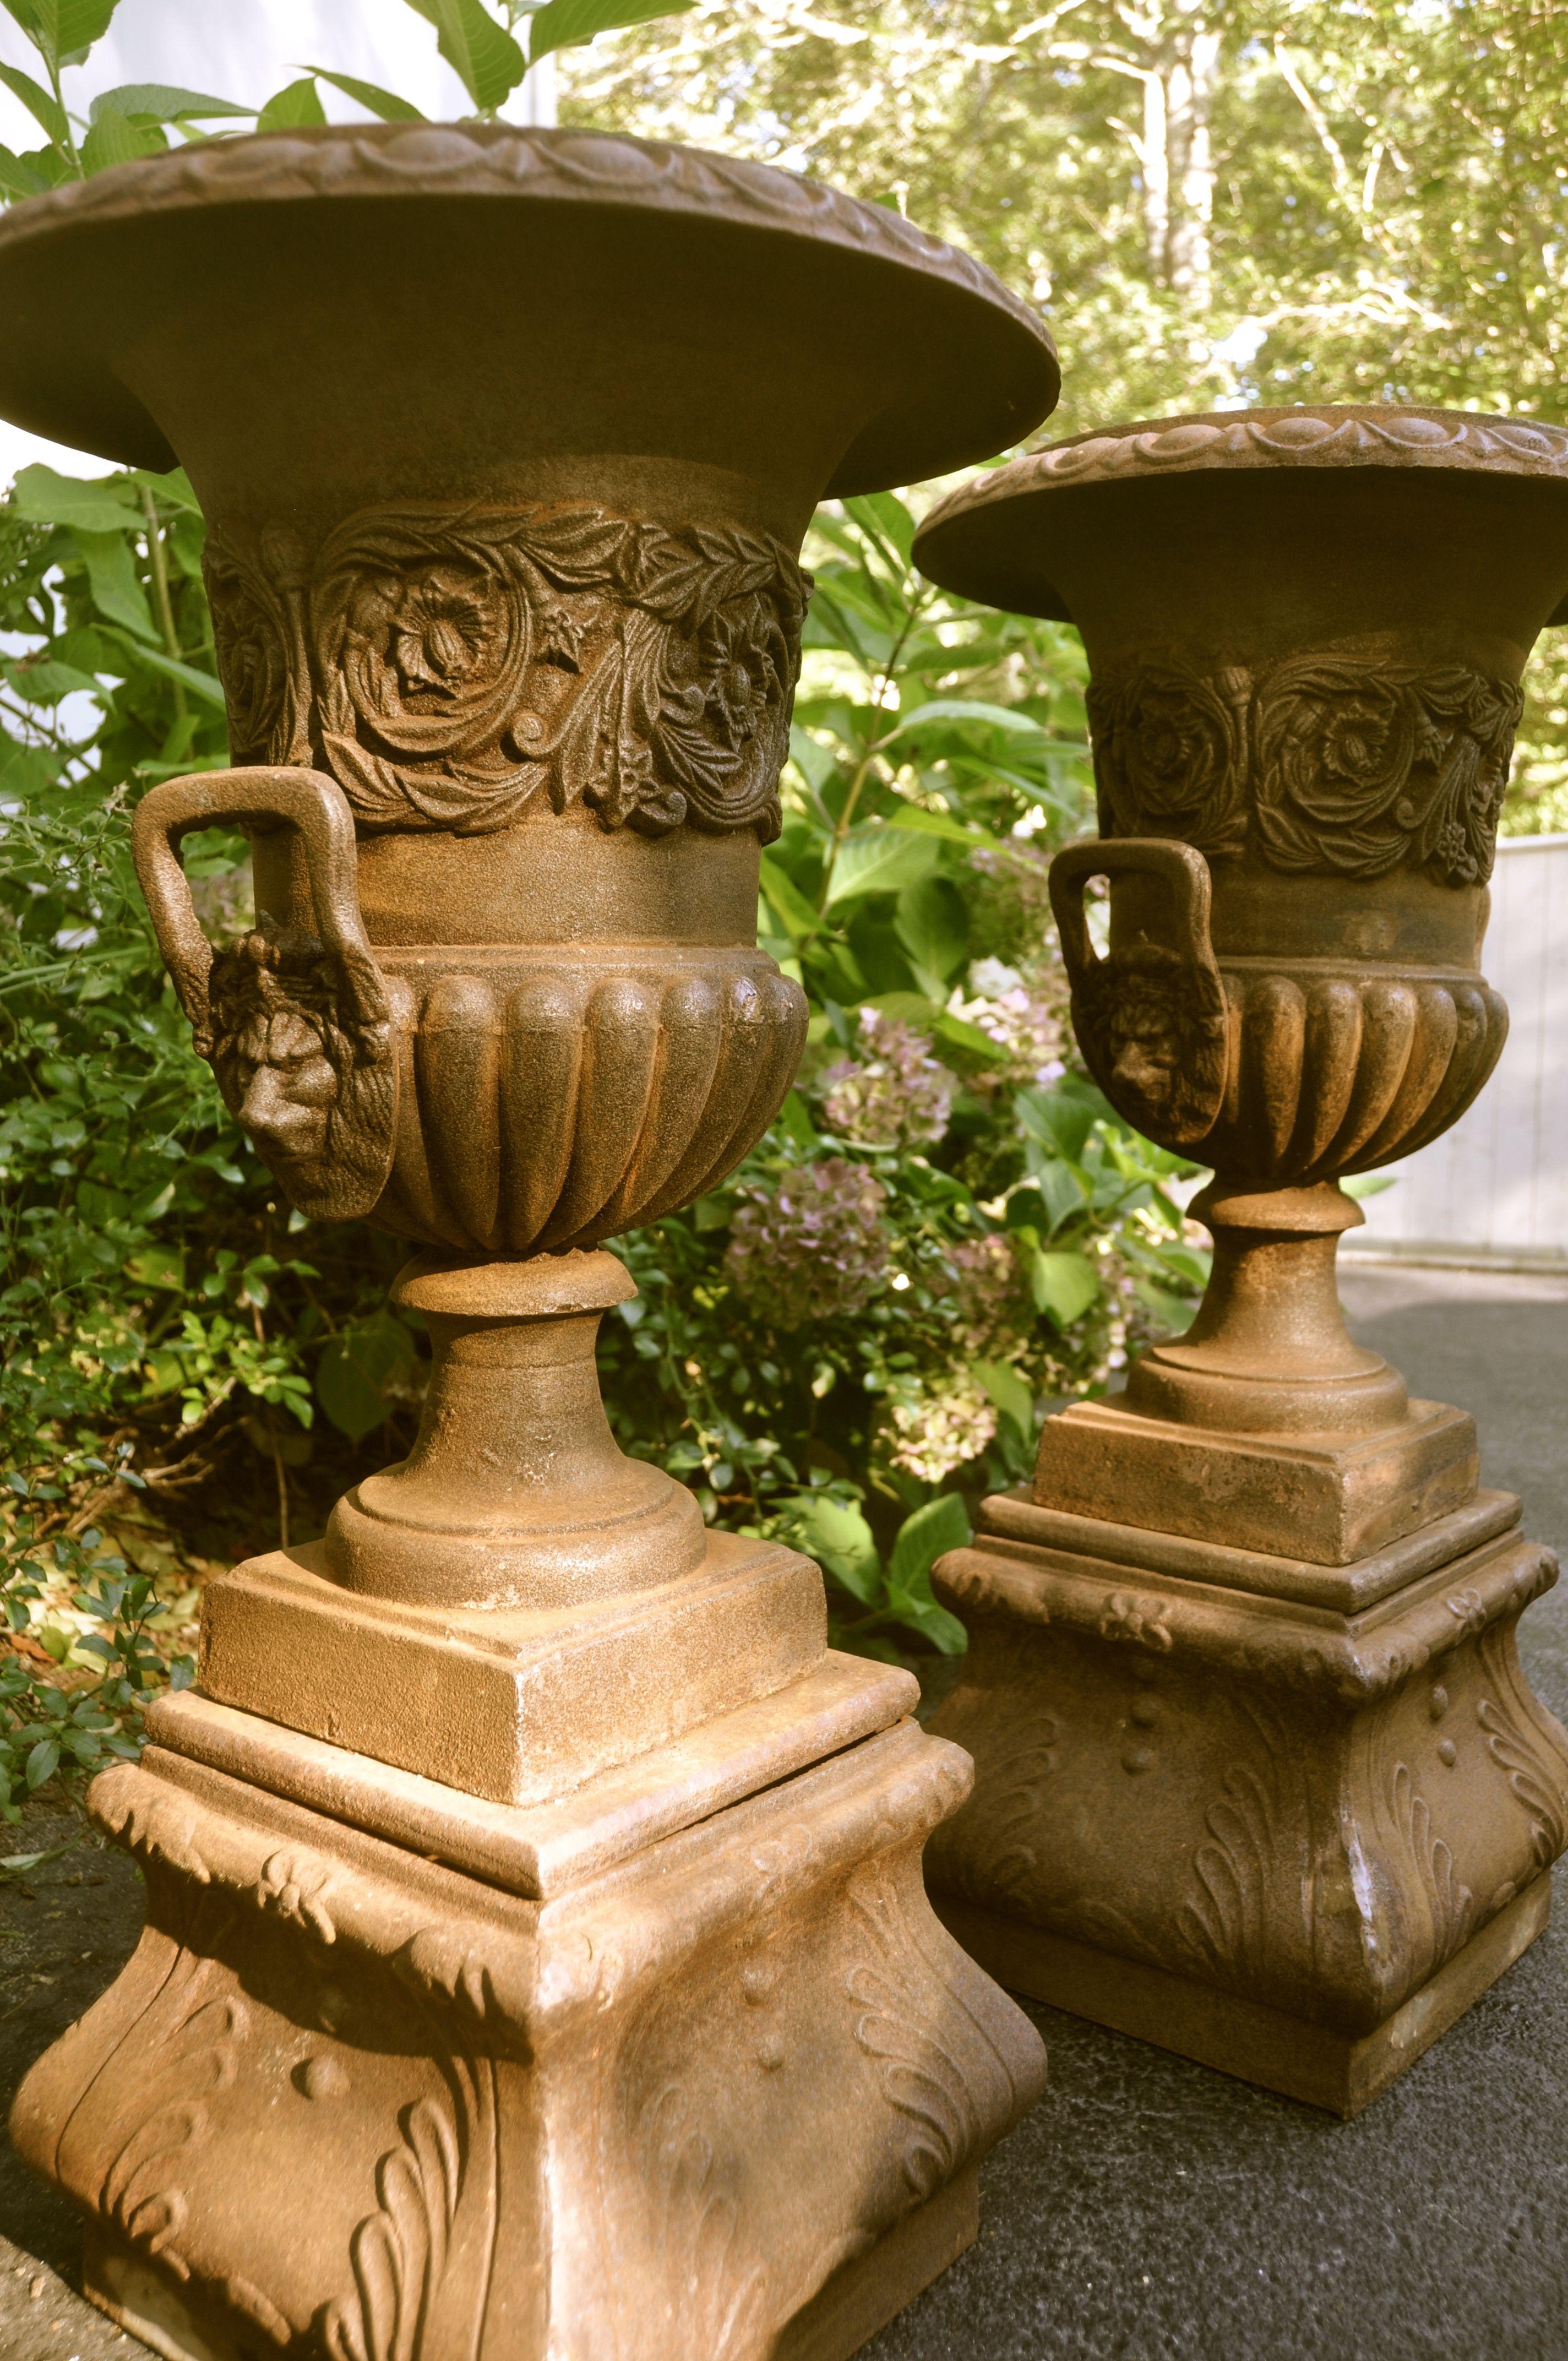 pedestal urns | Vases et coupes MEDICIS | Pinterest